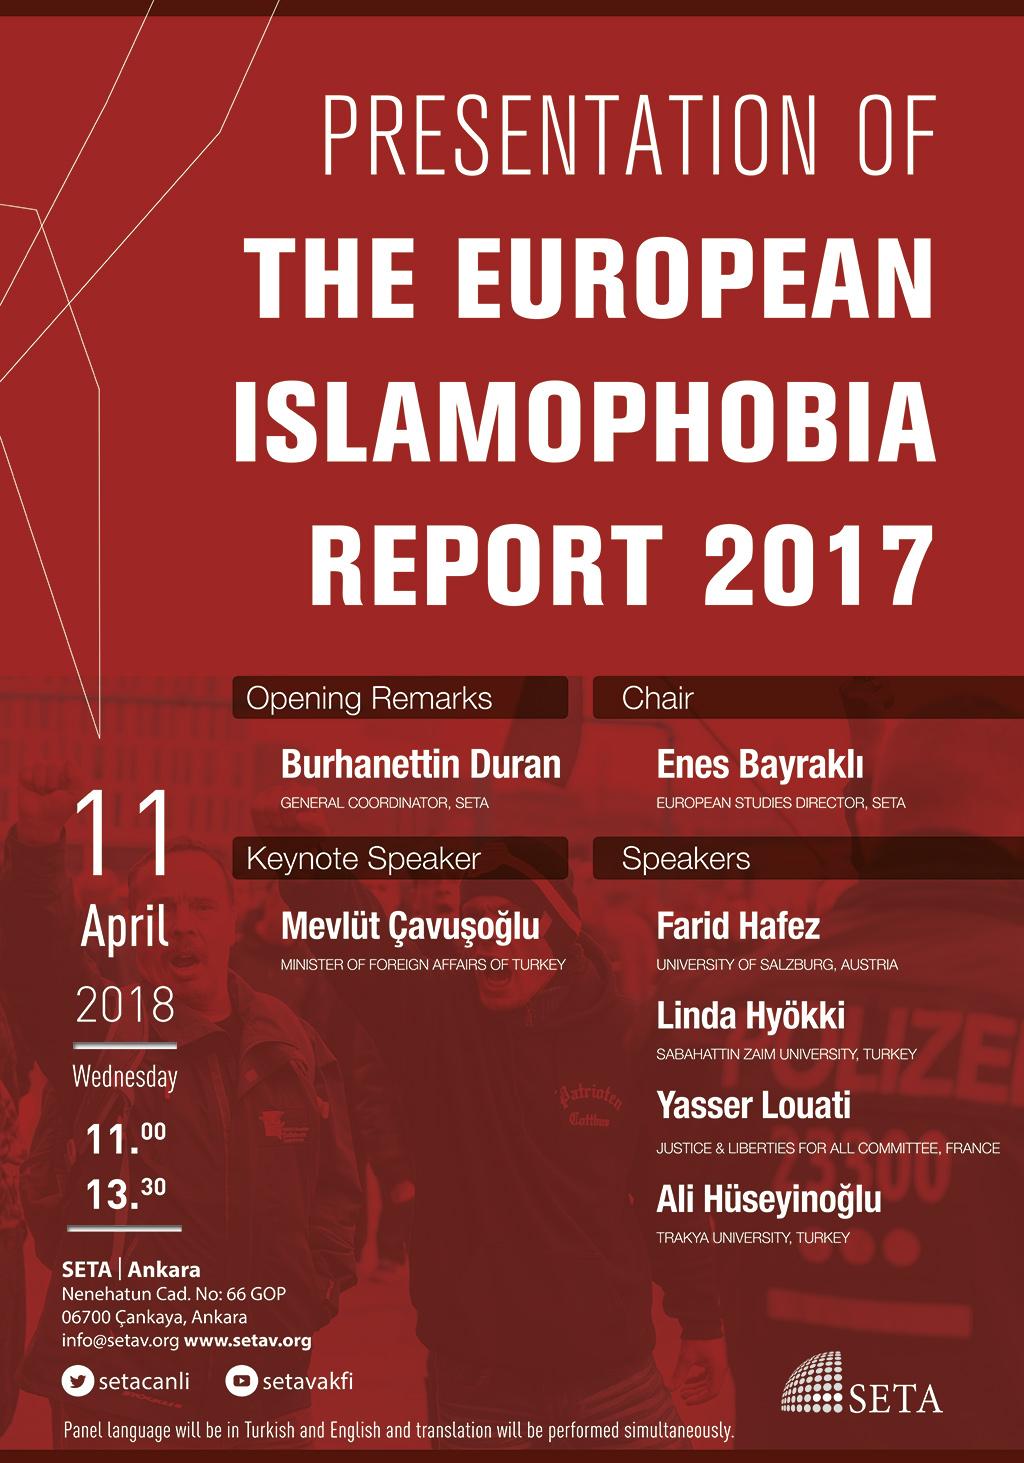 Presentation of the European Islamophobia Report 2017